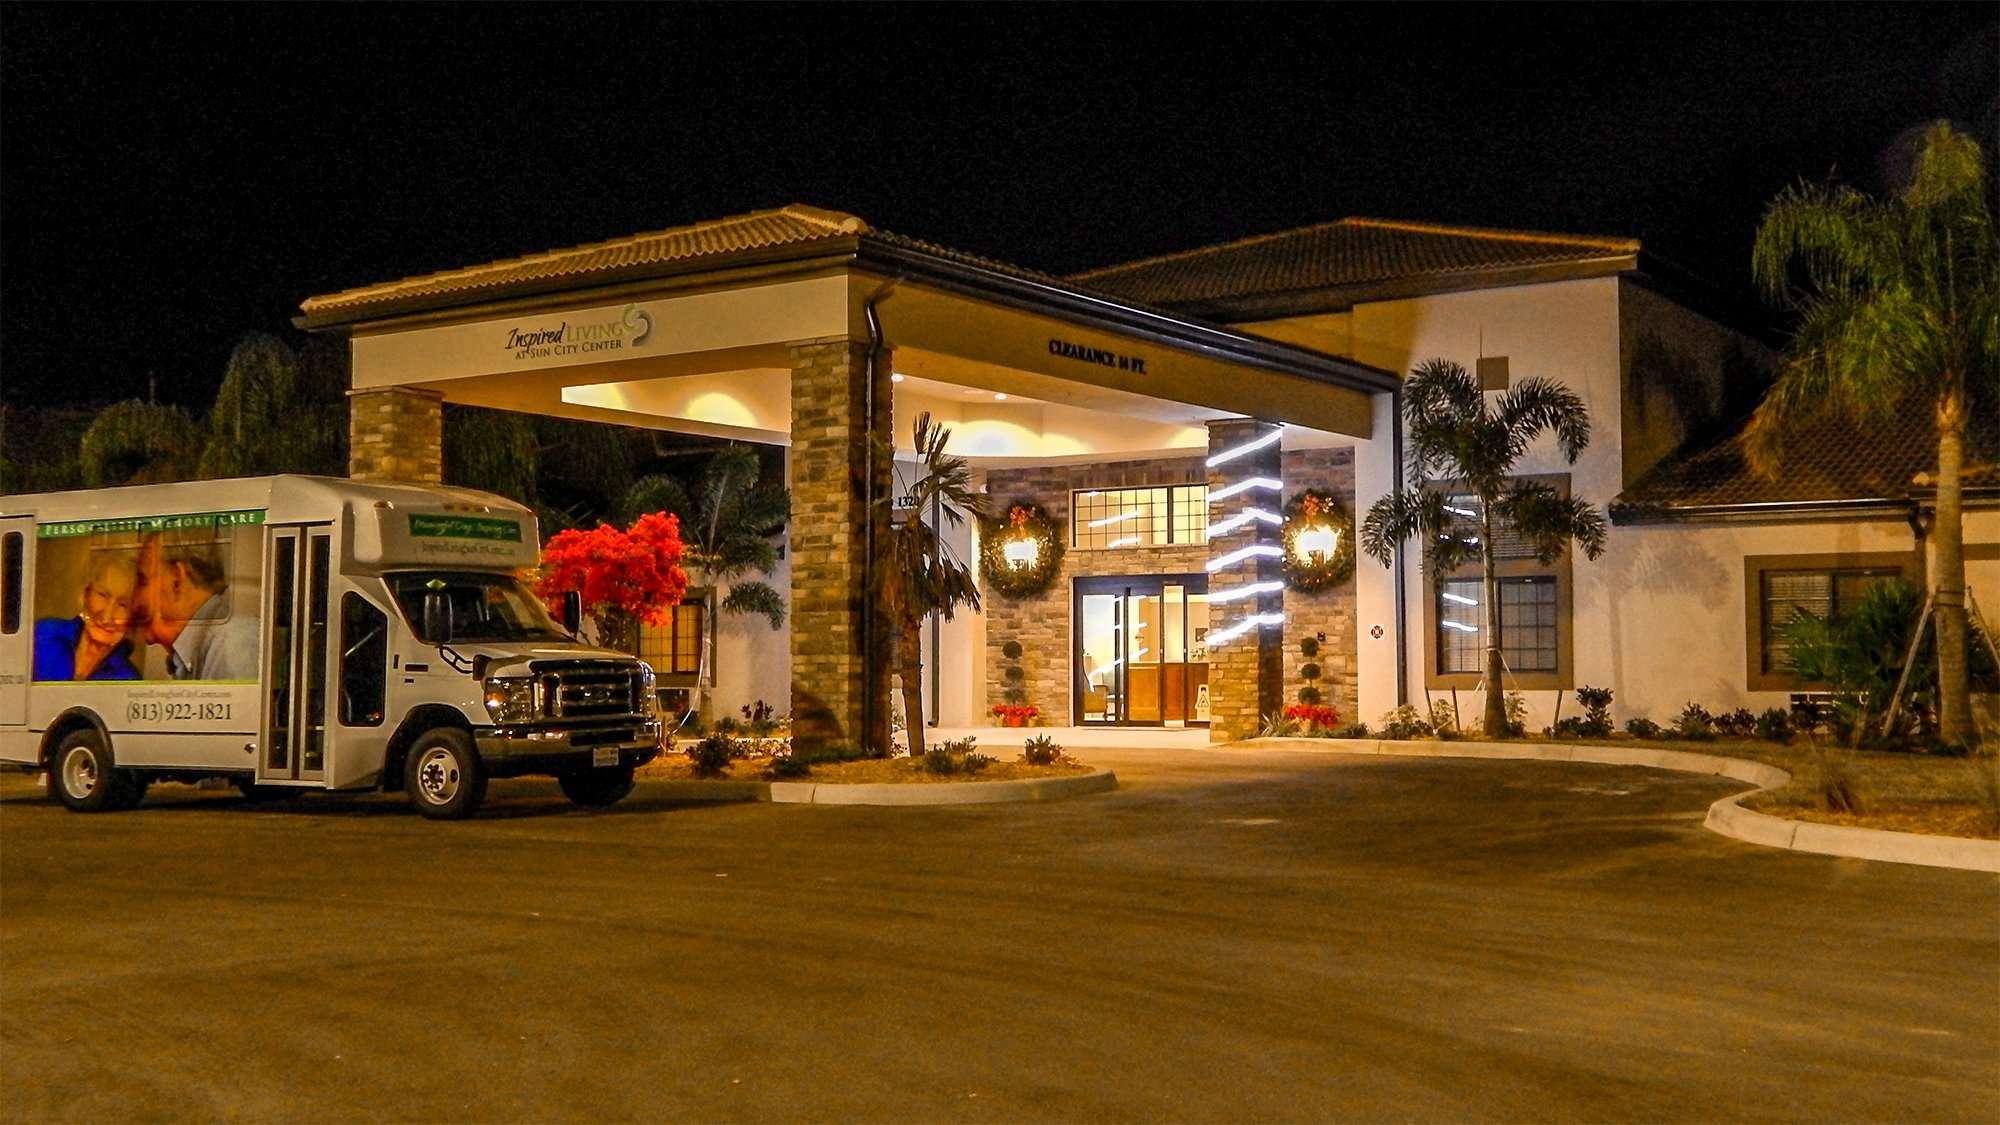 Inspired Living Community in Sun City Center during Christmas season on December 17, 2014 in Southshore, FL